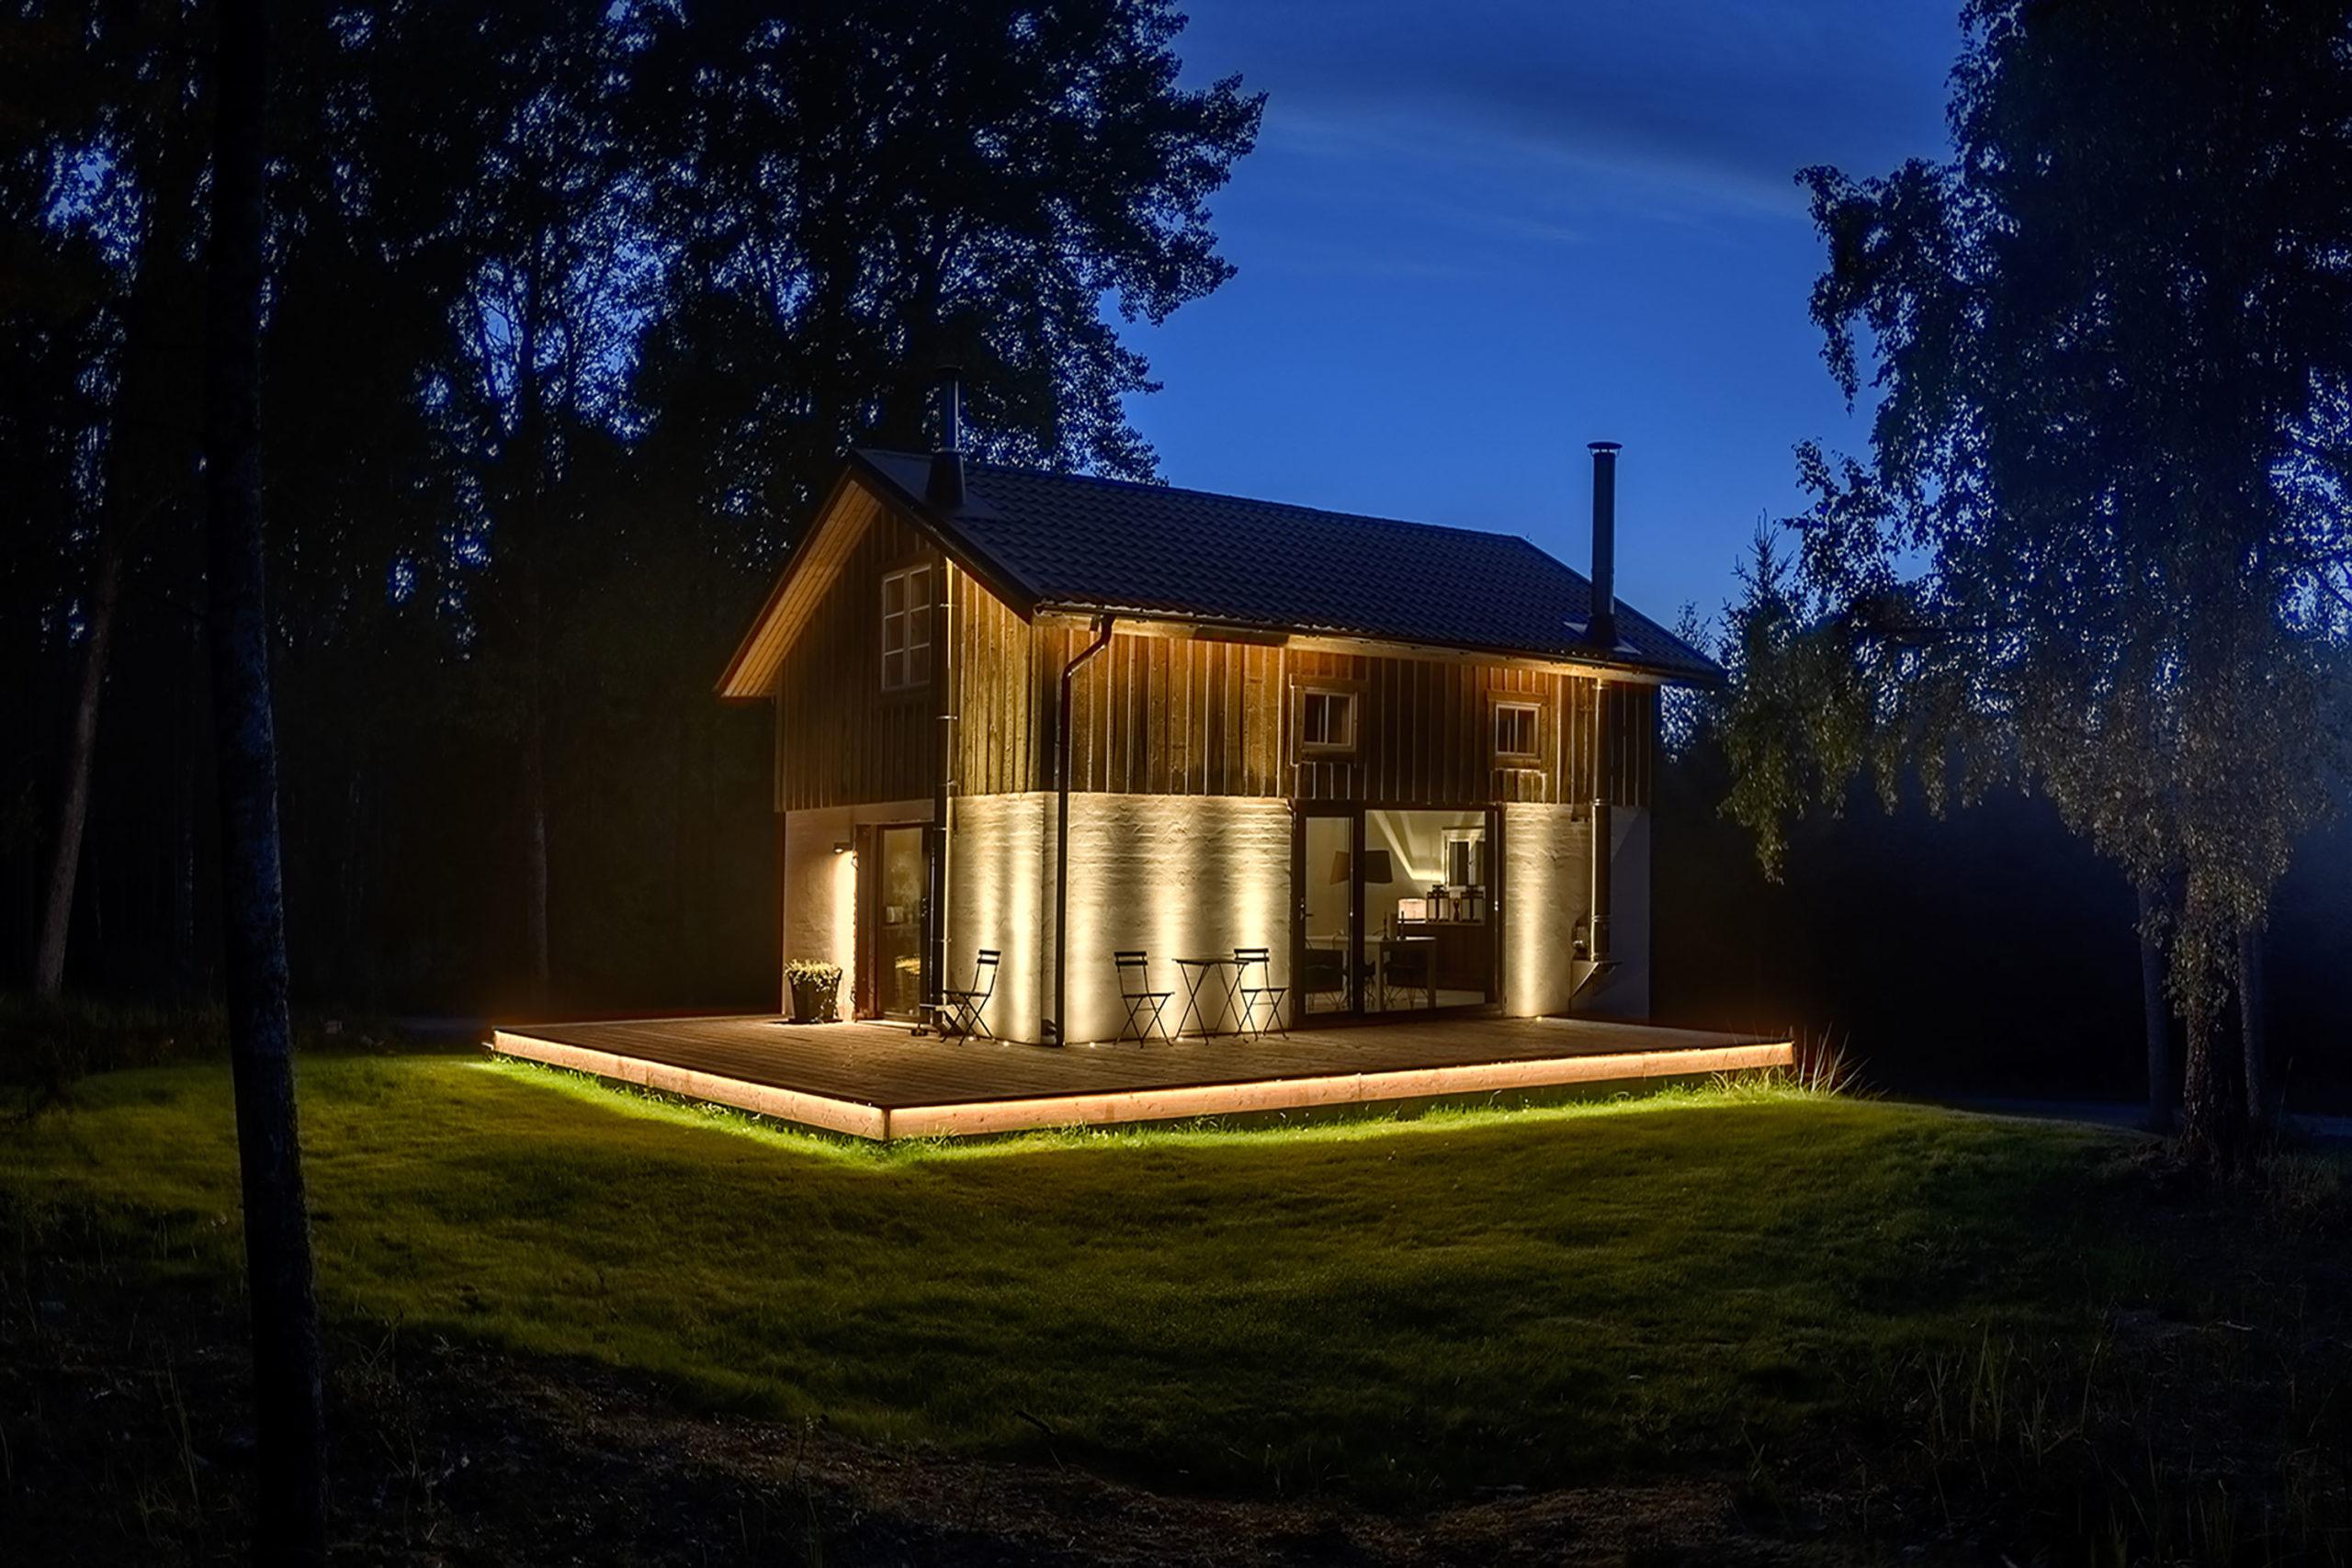 Guest House, Hanko